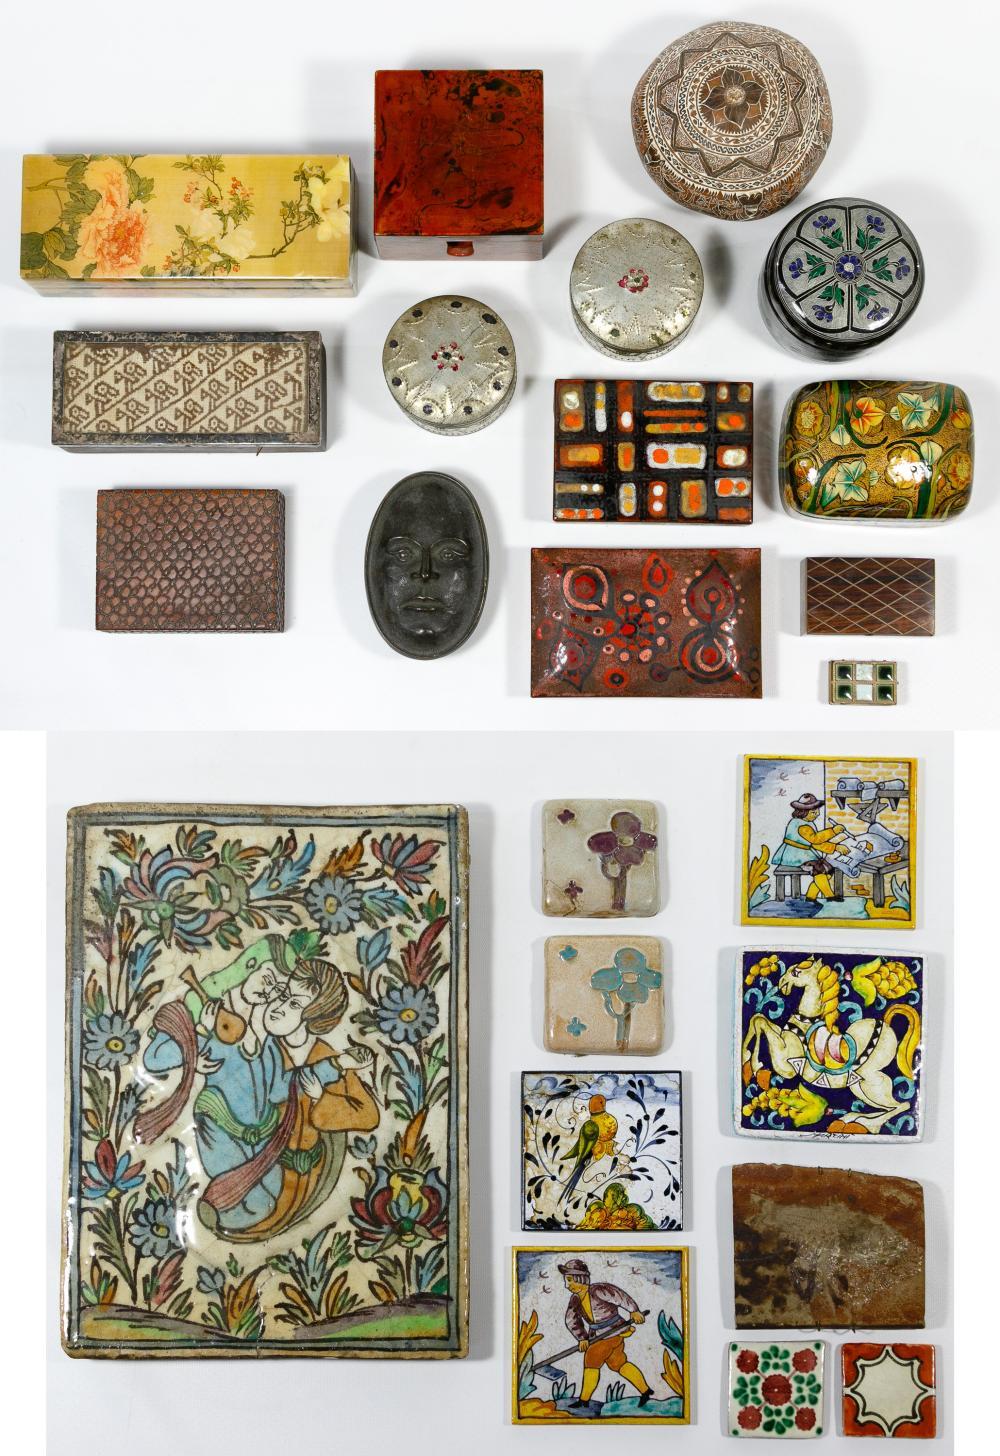 Ceramic Tile and Decorative Box Assortment